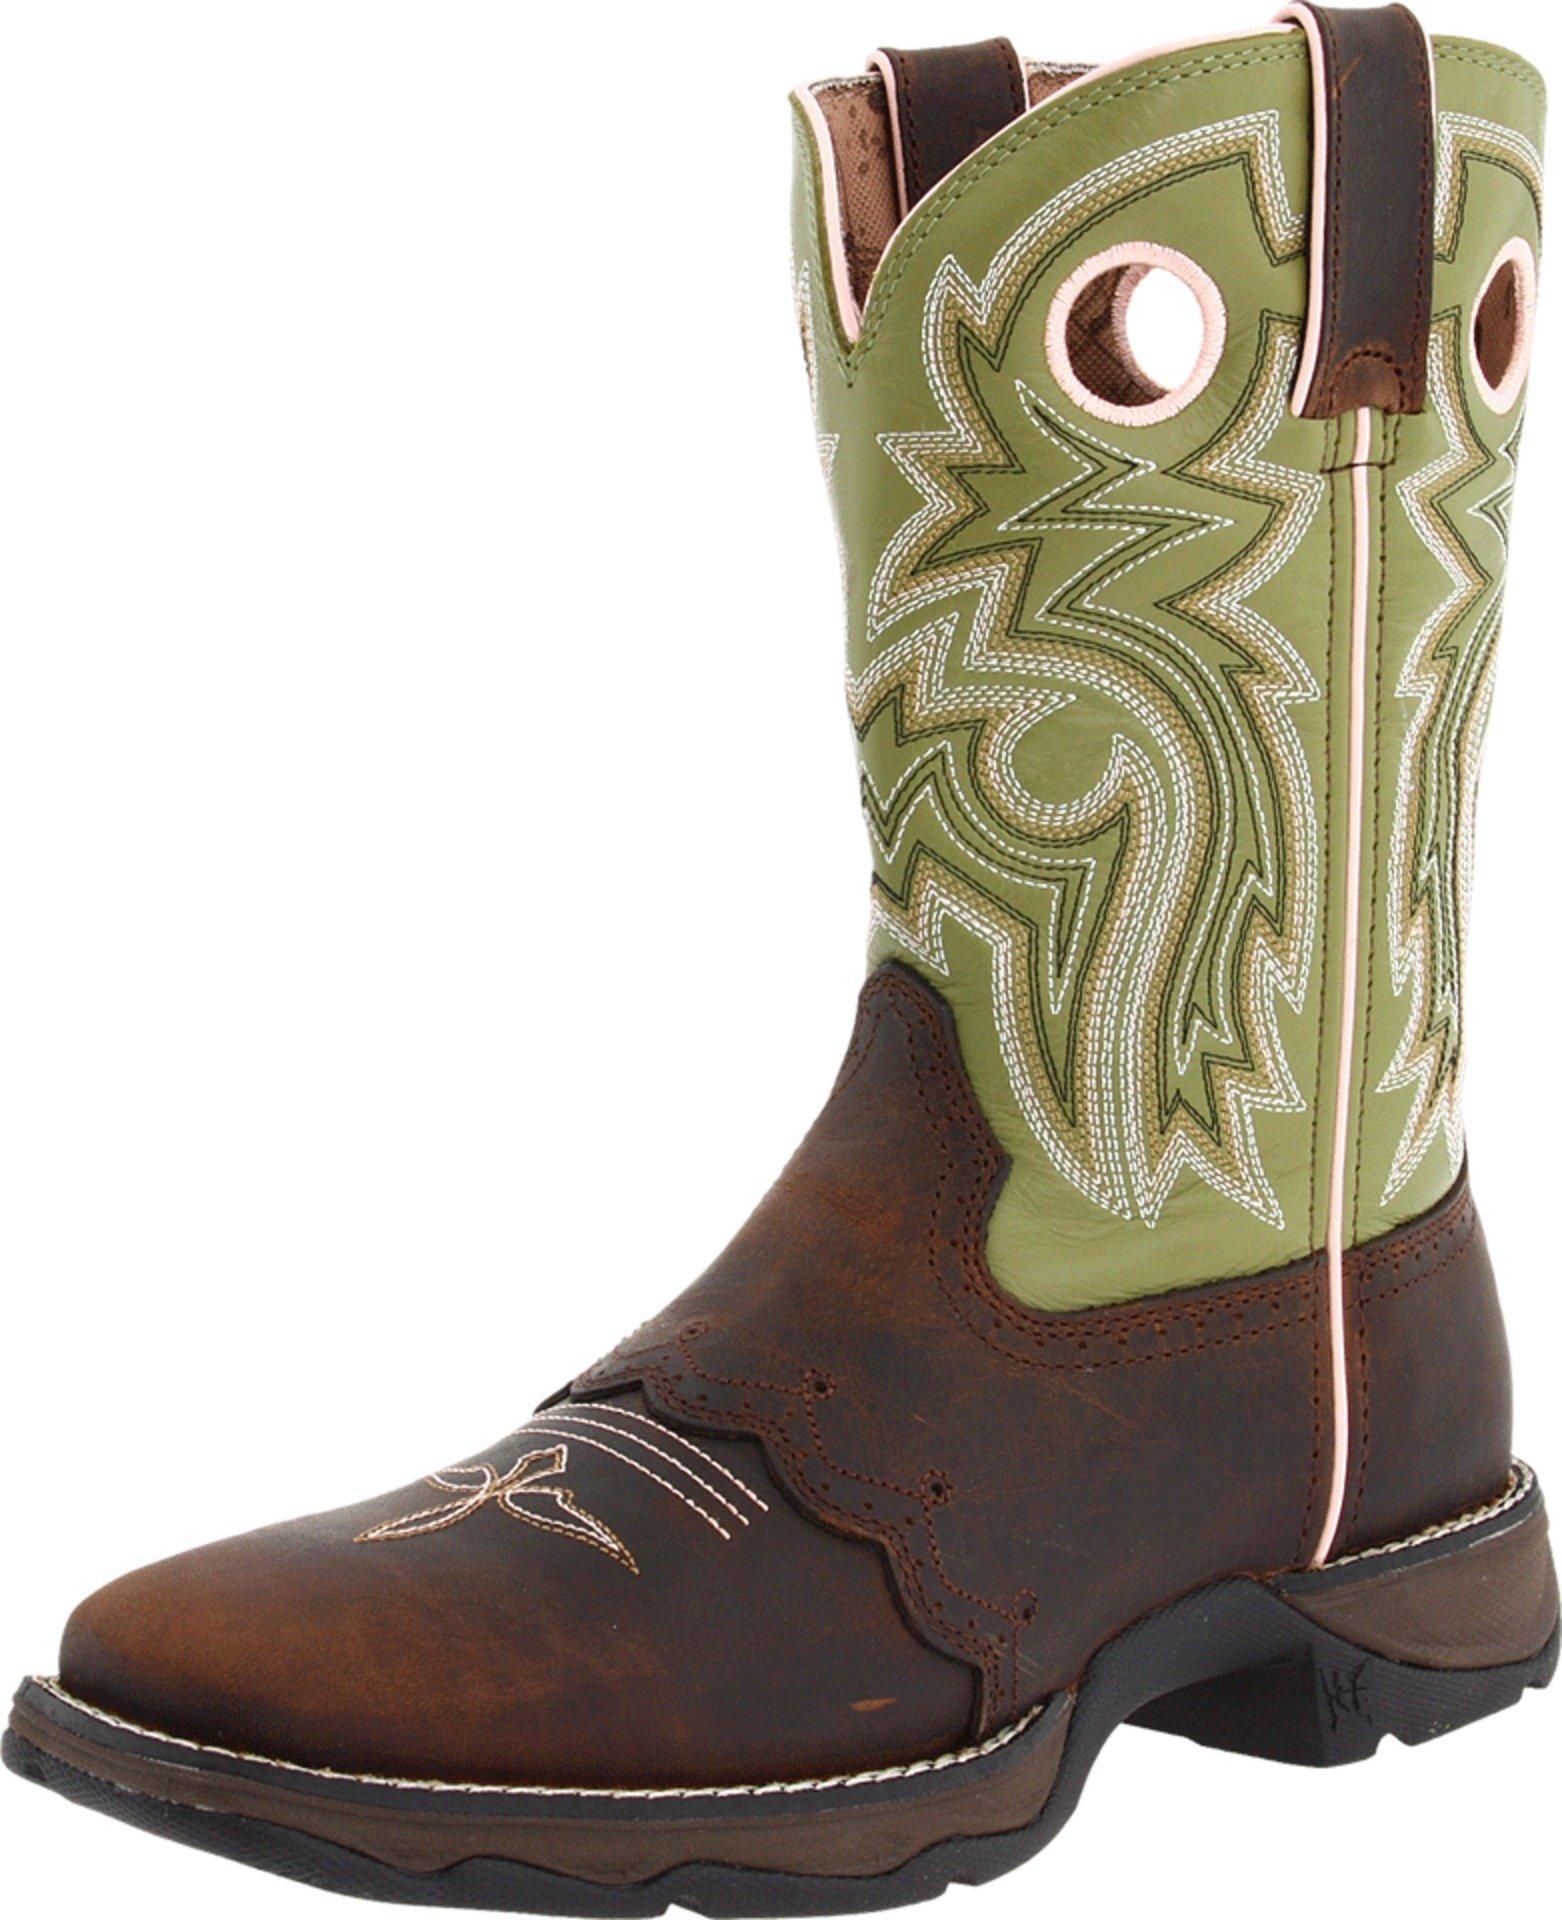 Women's Durango Square Toe Western Boots BROWN 9.5 M